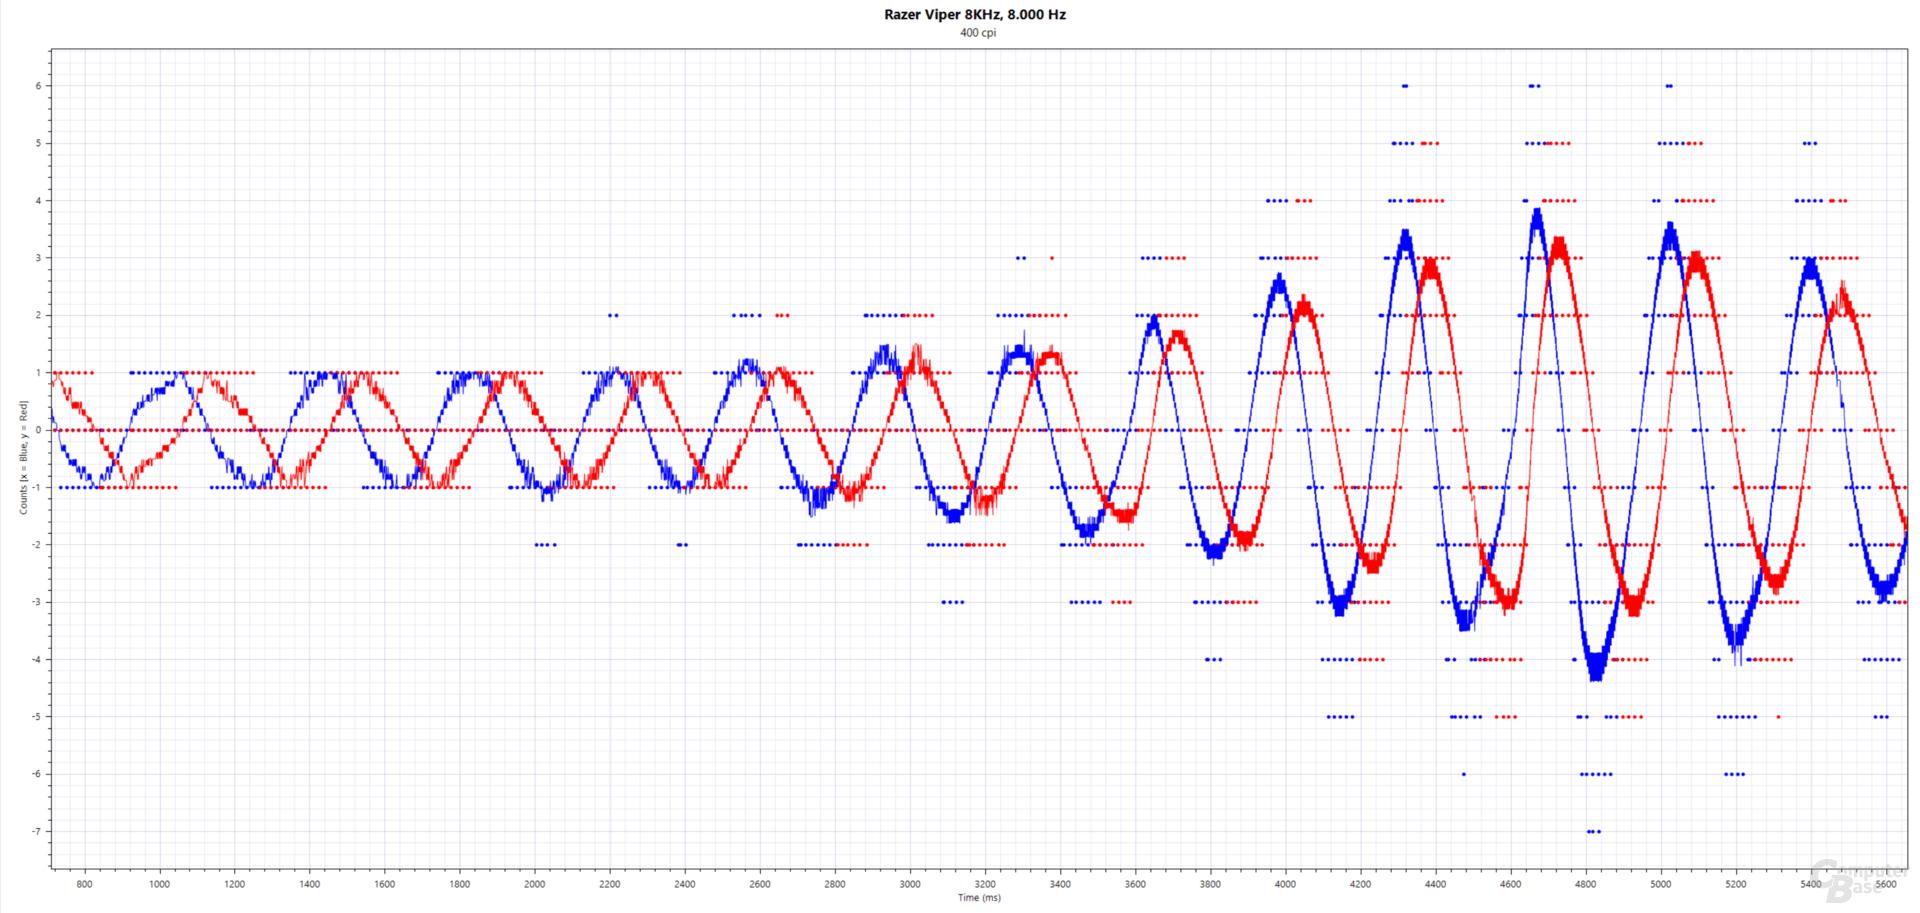 Blau: xCounts(ms), Rot: yCounts(ms); Razer Viper 8KHz (PMW-3399, 400 cpi, 8.000 Hertz, Stoffmauspad)